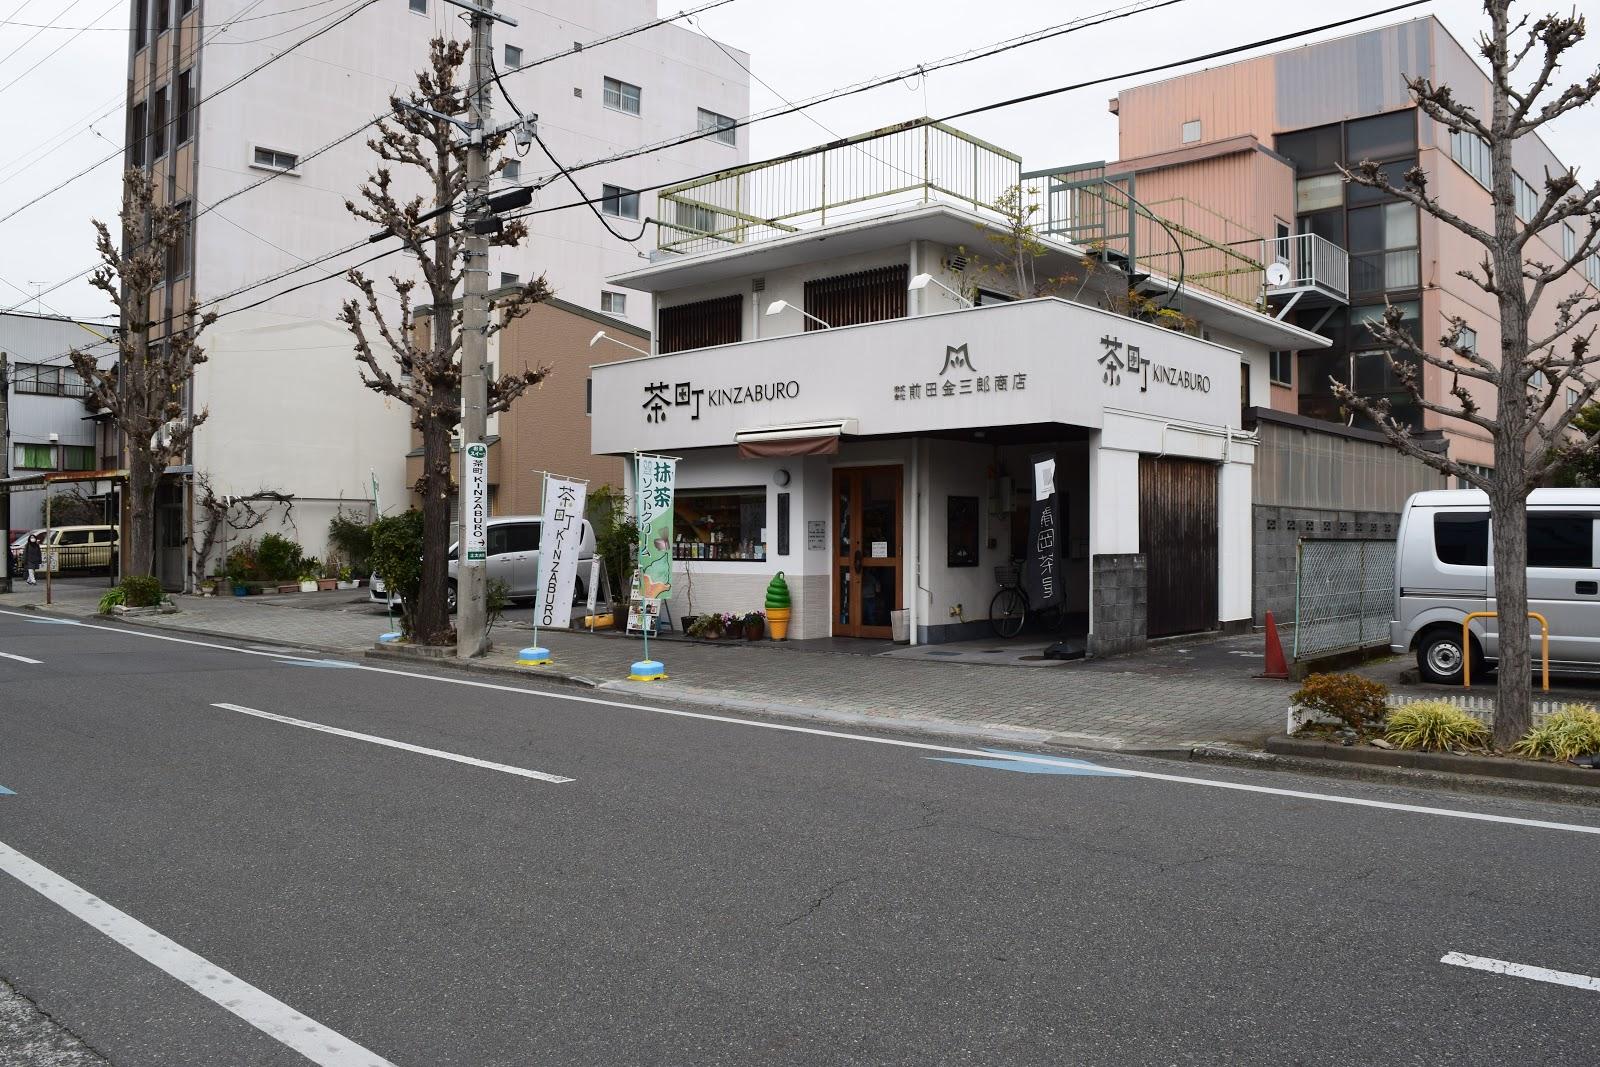 Chamachi Kinzaburo in Shizuoka city